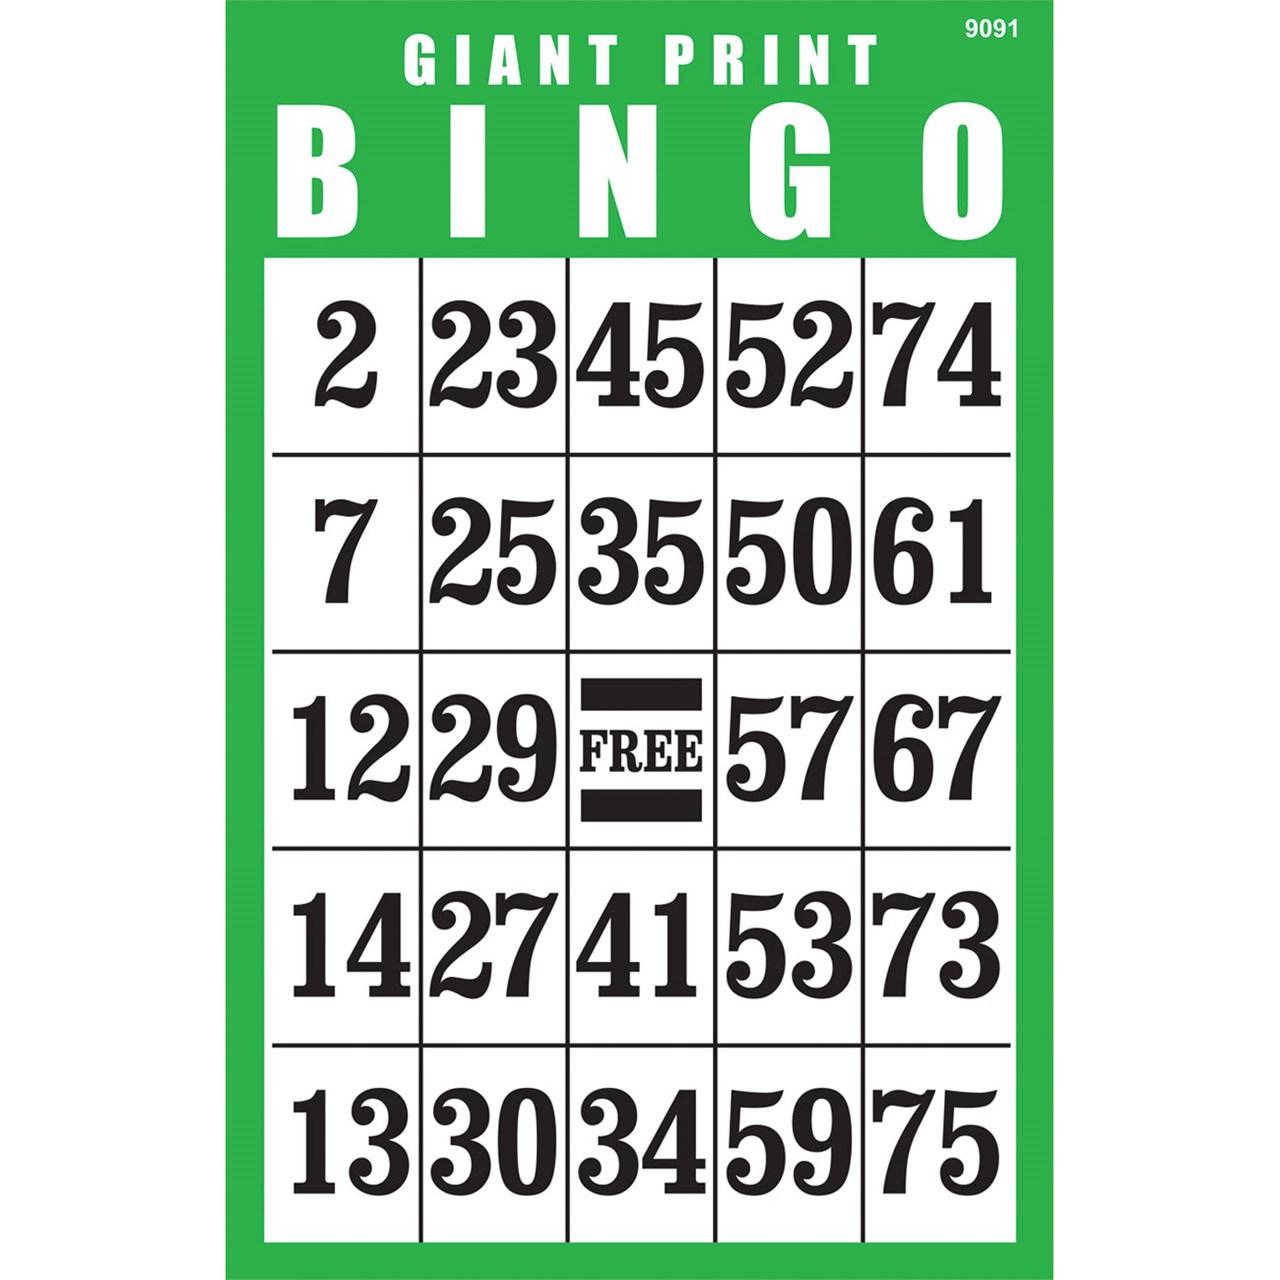 Giant Print Bingo Card- Green